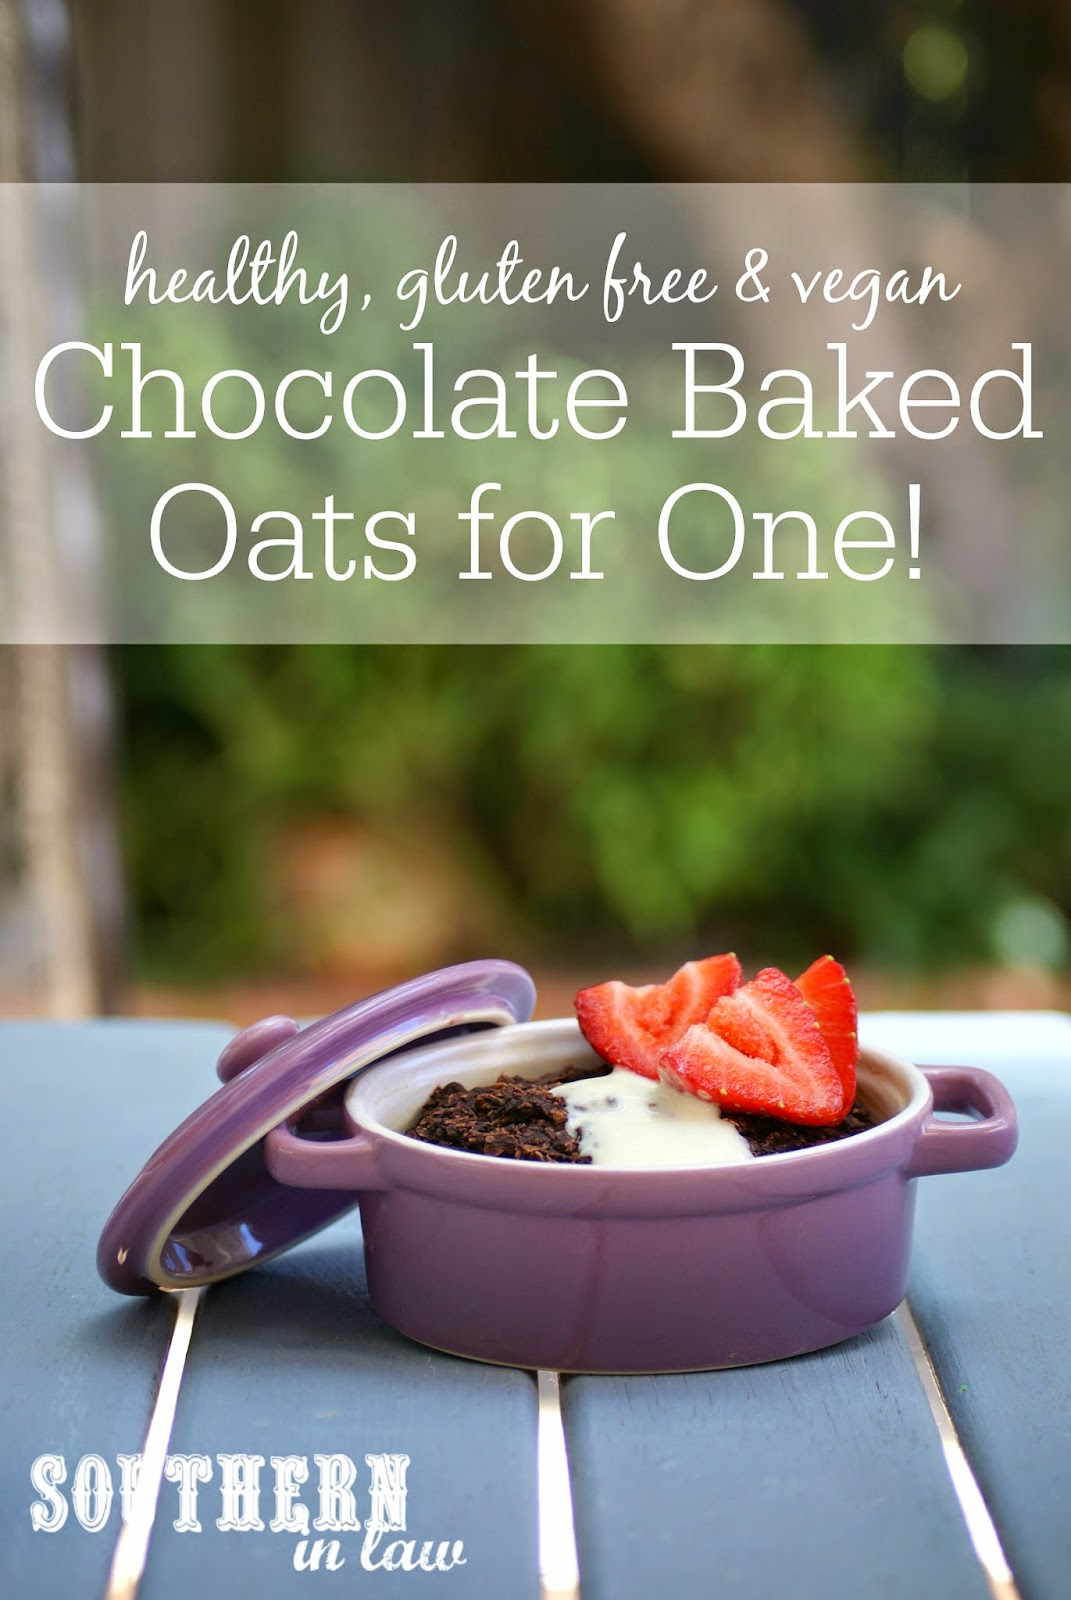 Healthy Chocolate Baked Oats Recipe - low fat, gluten free, sugar free, vegan, healthy